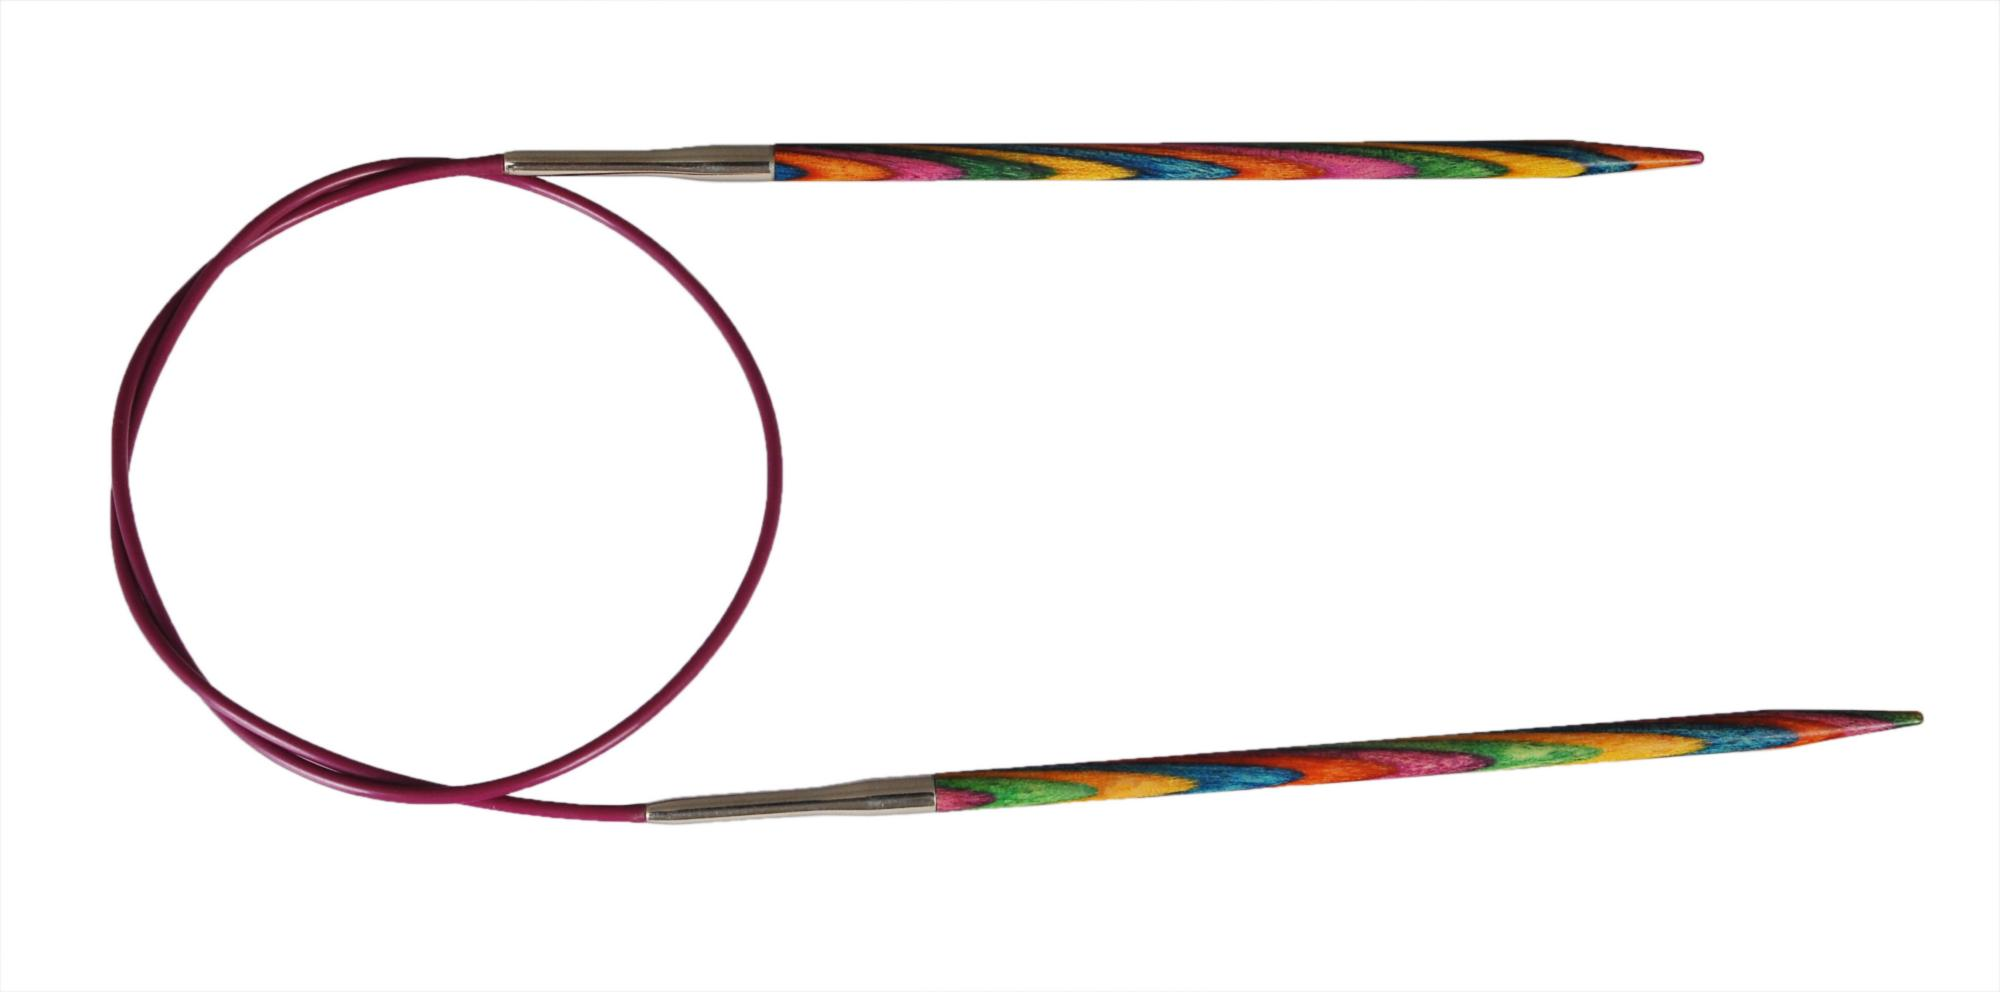 Спицы круговые 60 см Symfonie Wood KnitPro, 21331, 10.00 мм